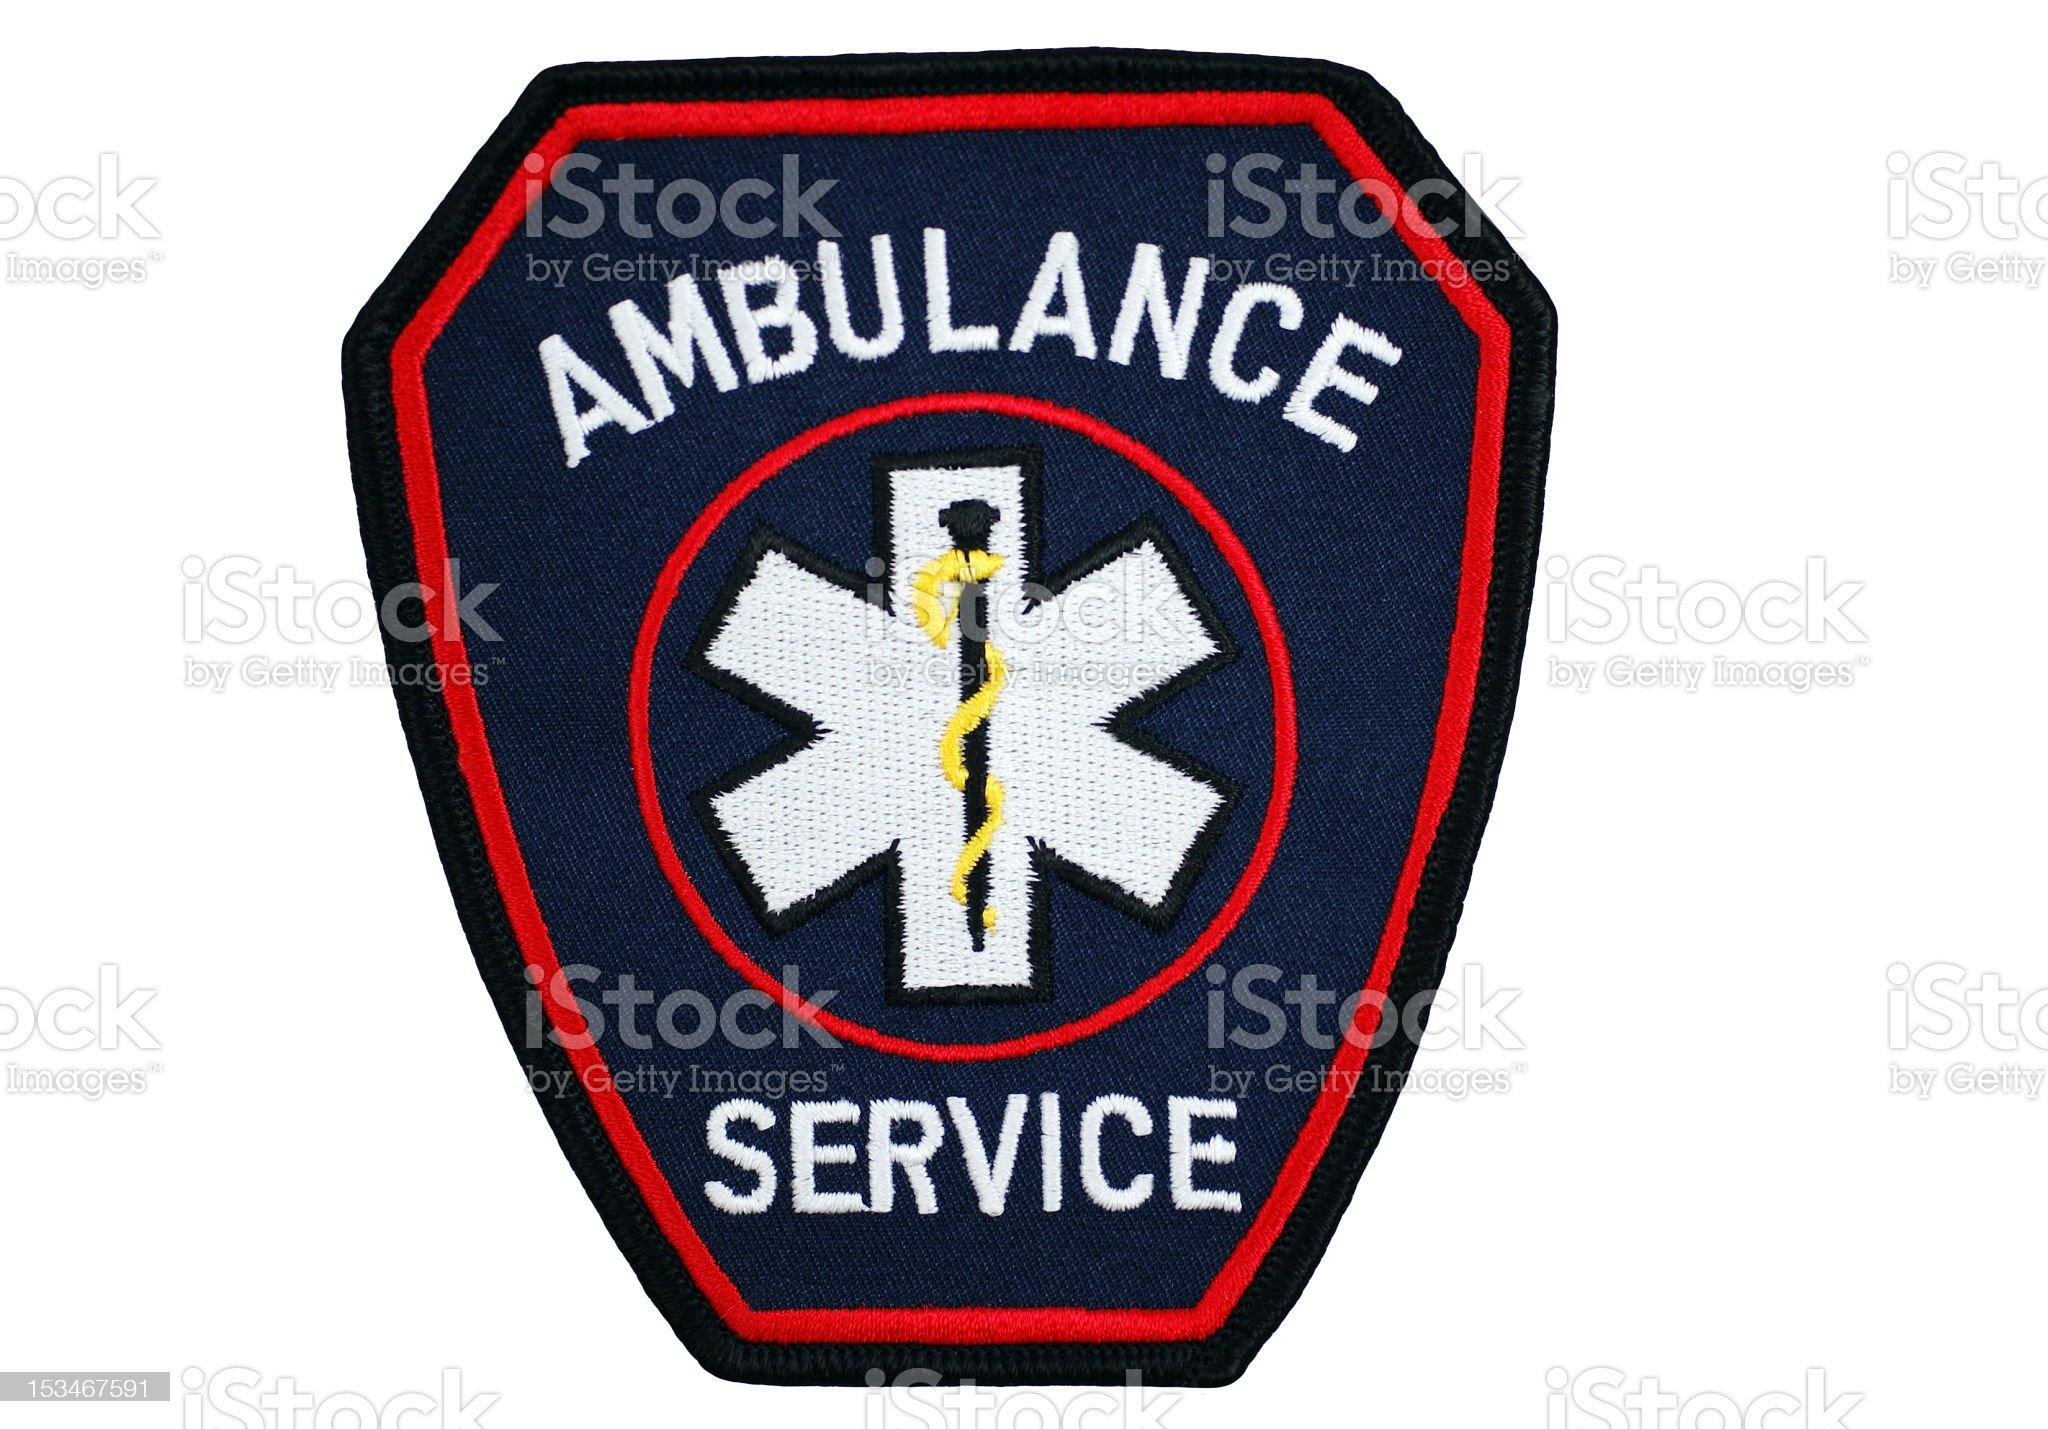 Ambulance Service Patch royalty-free stock photo